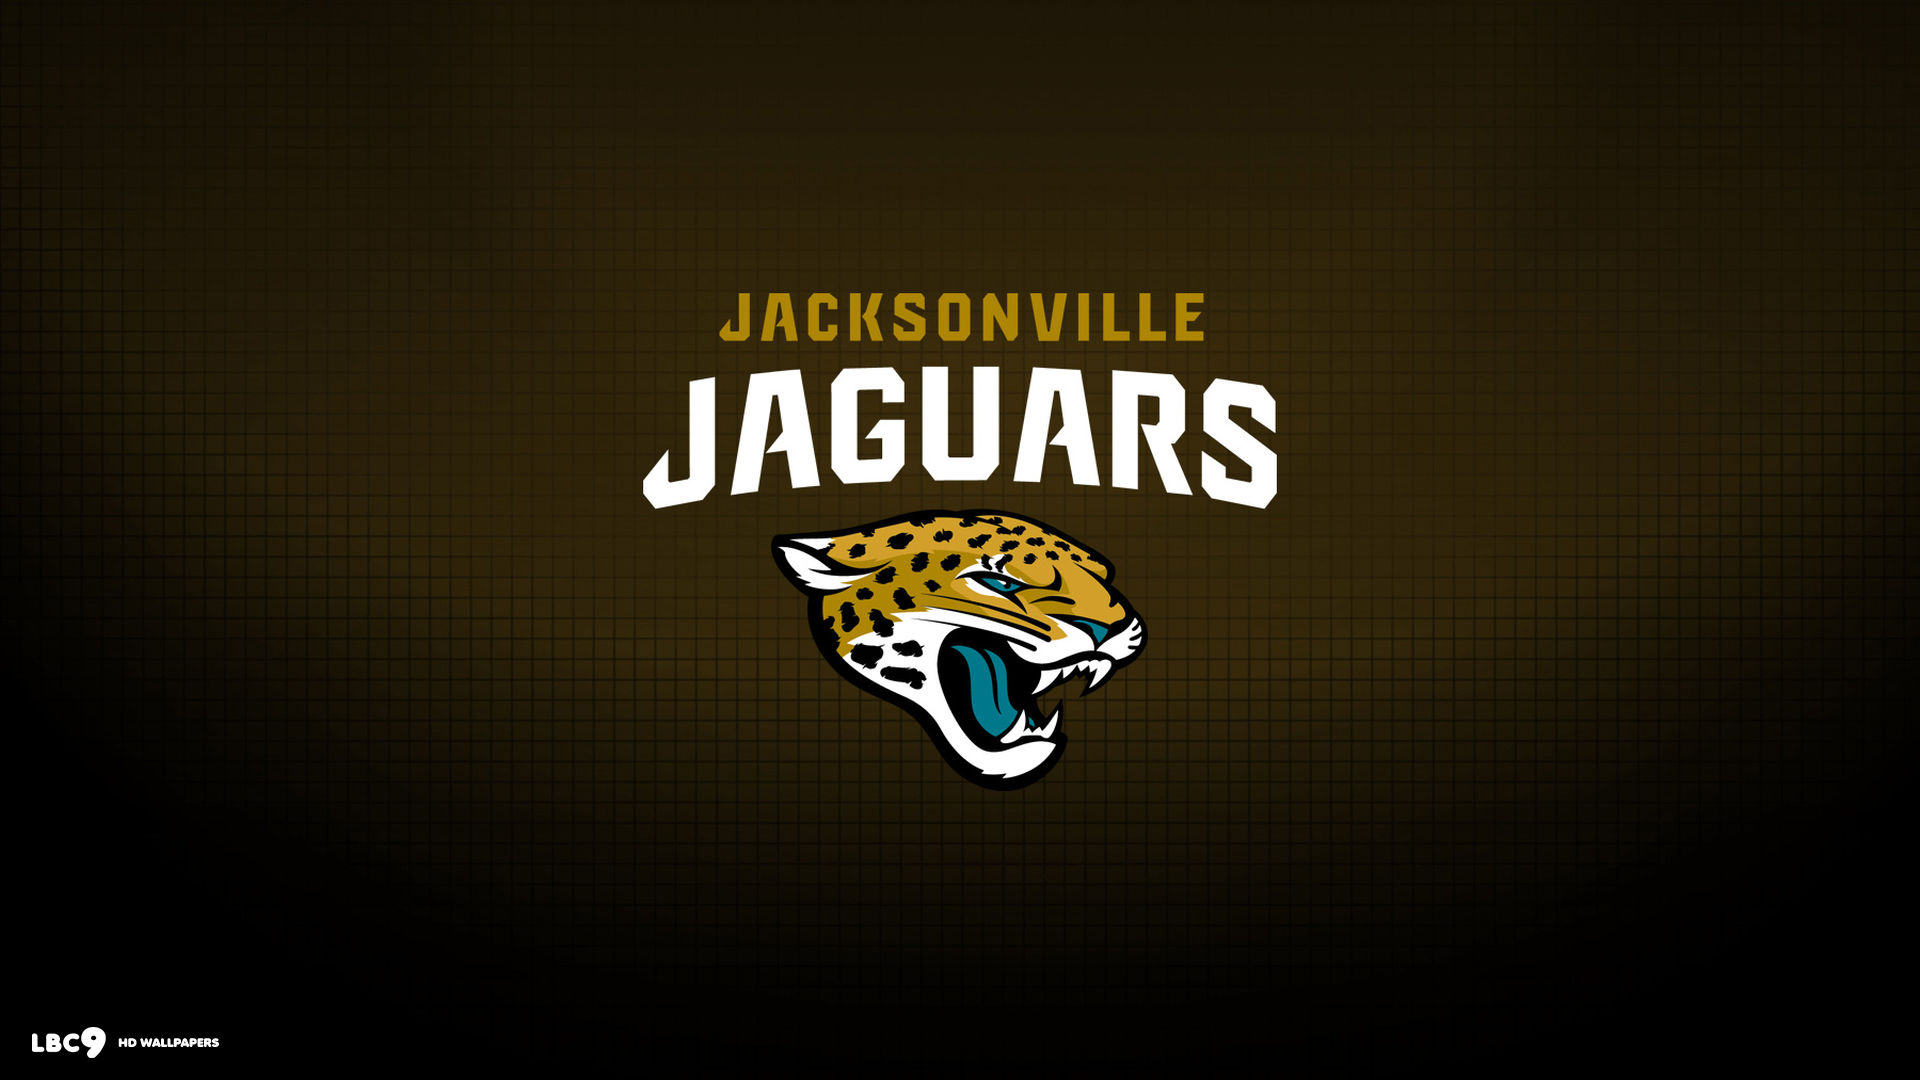 Jacksonville Jaguars Wallpaper 1920x1080